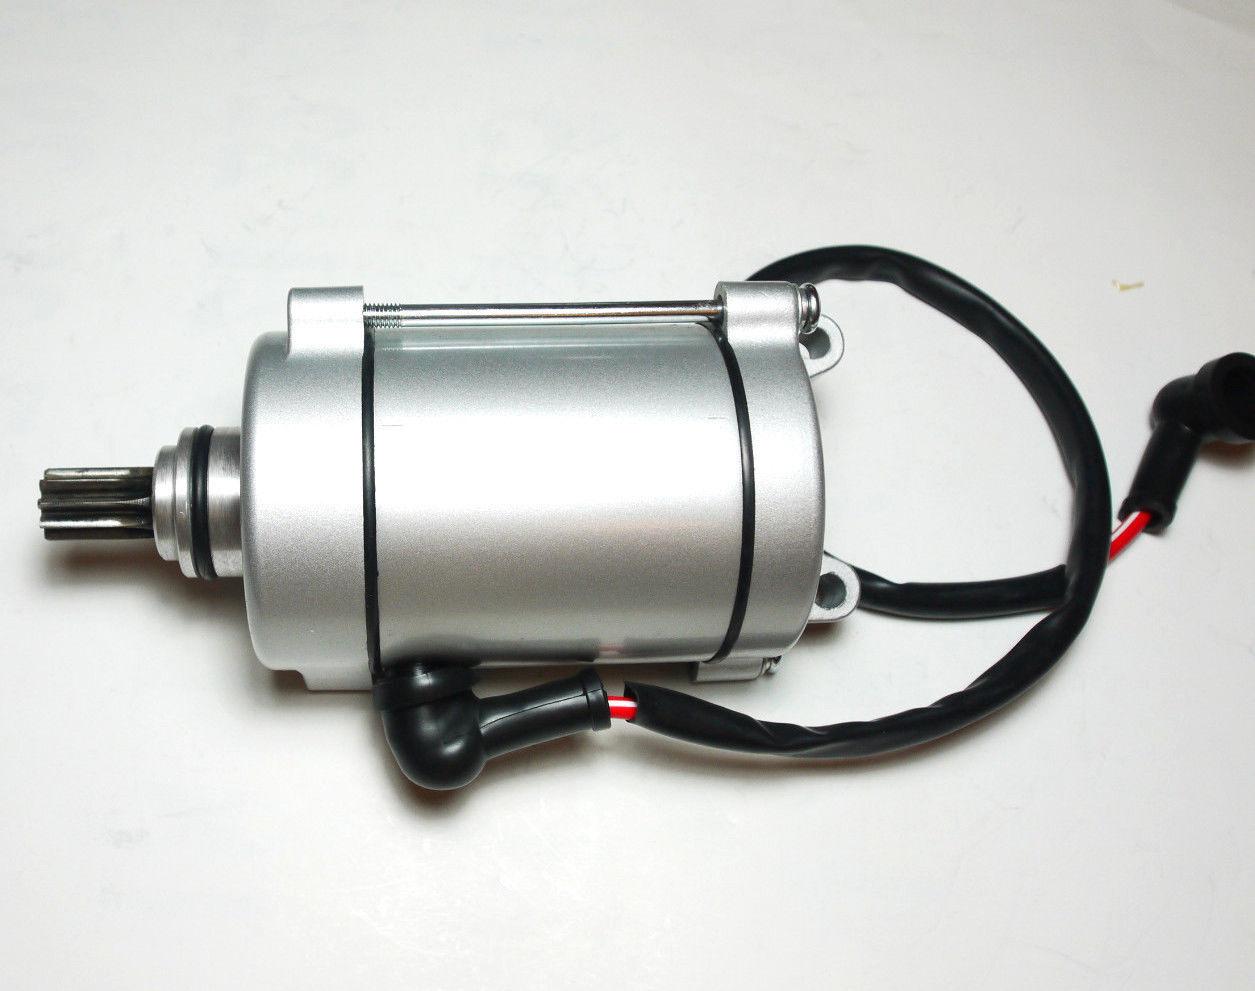 11T Electric Motor Starter Chinese ATV UTV Gokart Taotao Coolster 200cc 250cc